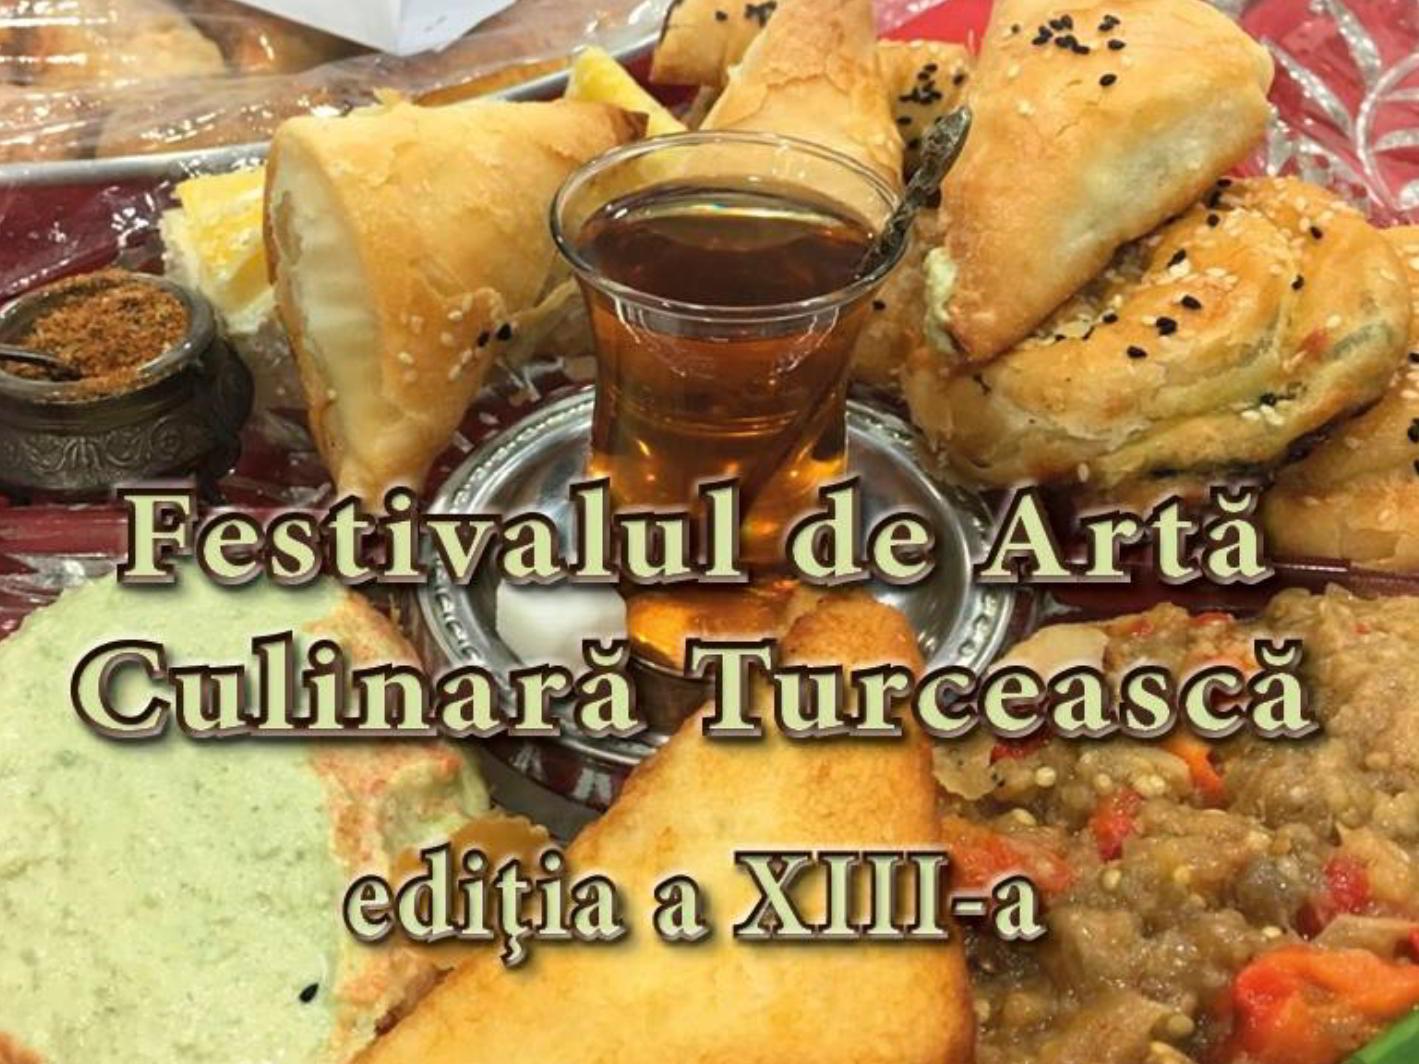 Festival de arta culinara turceasca in Constanta